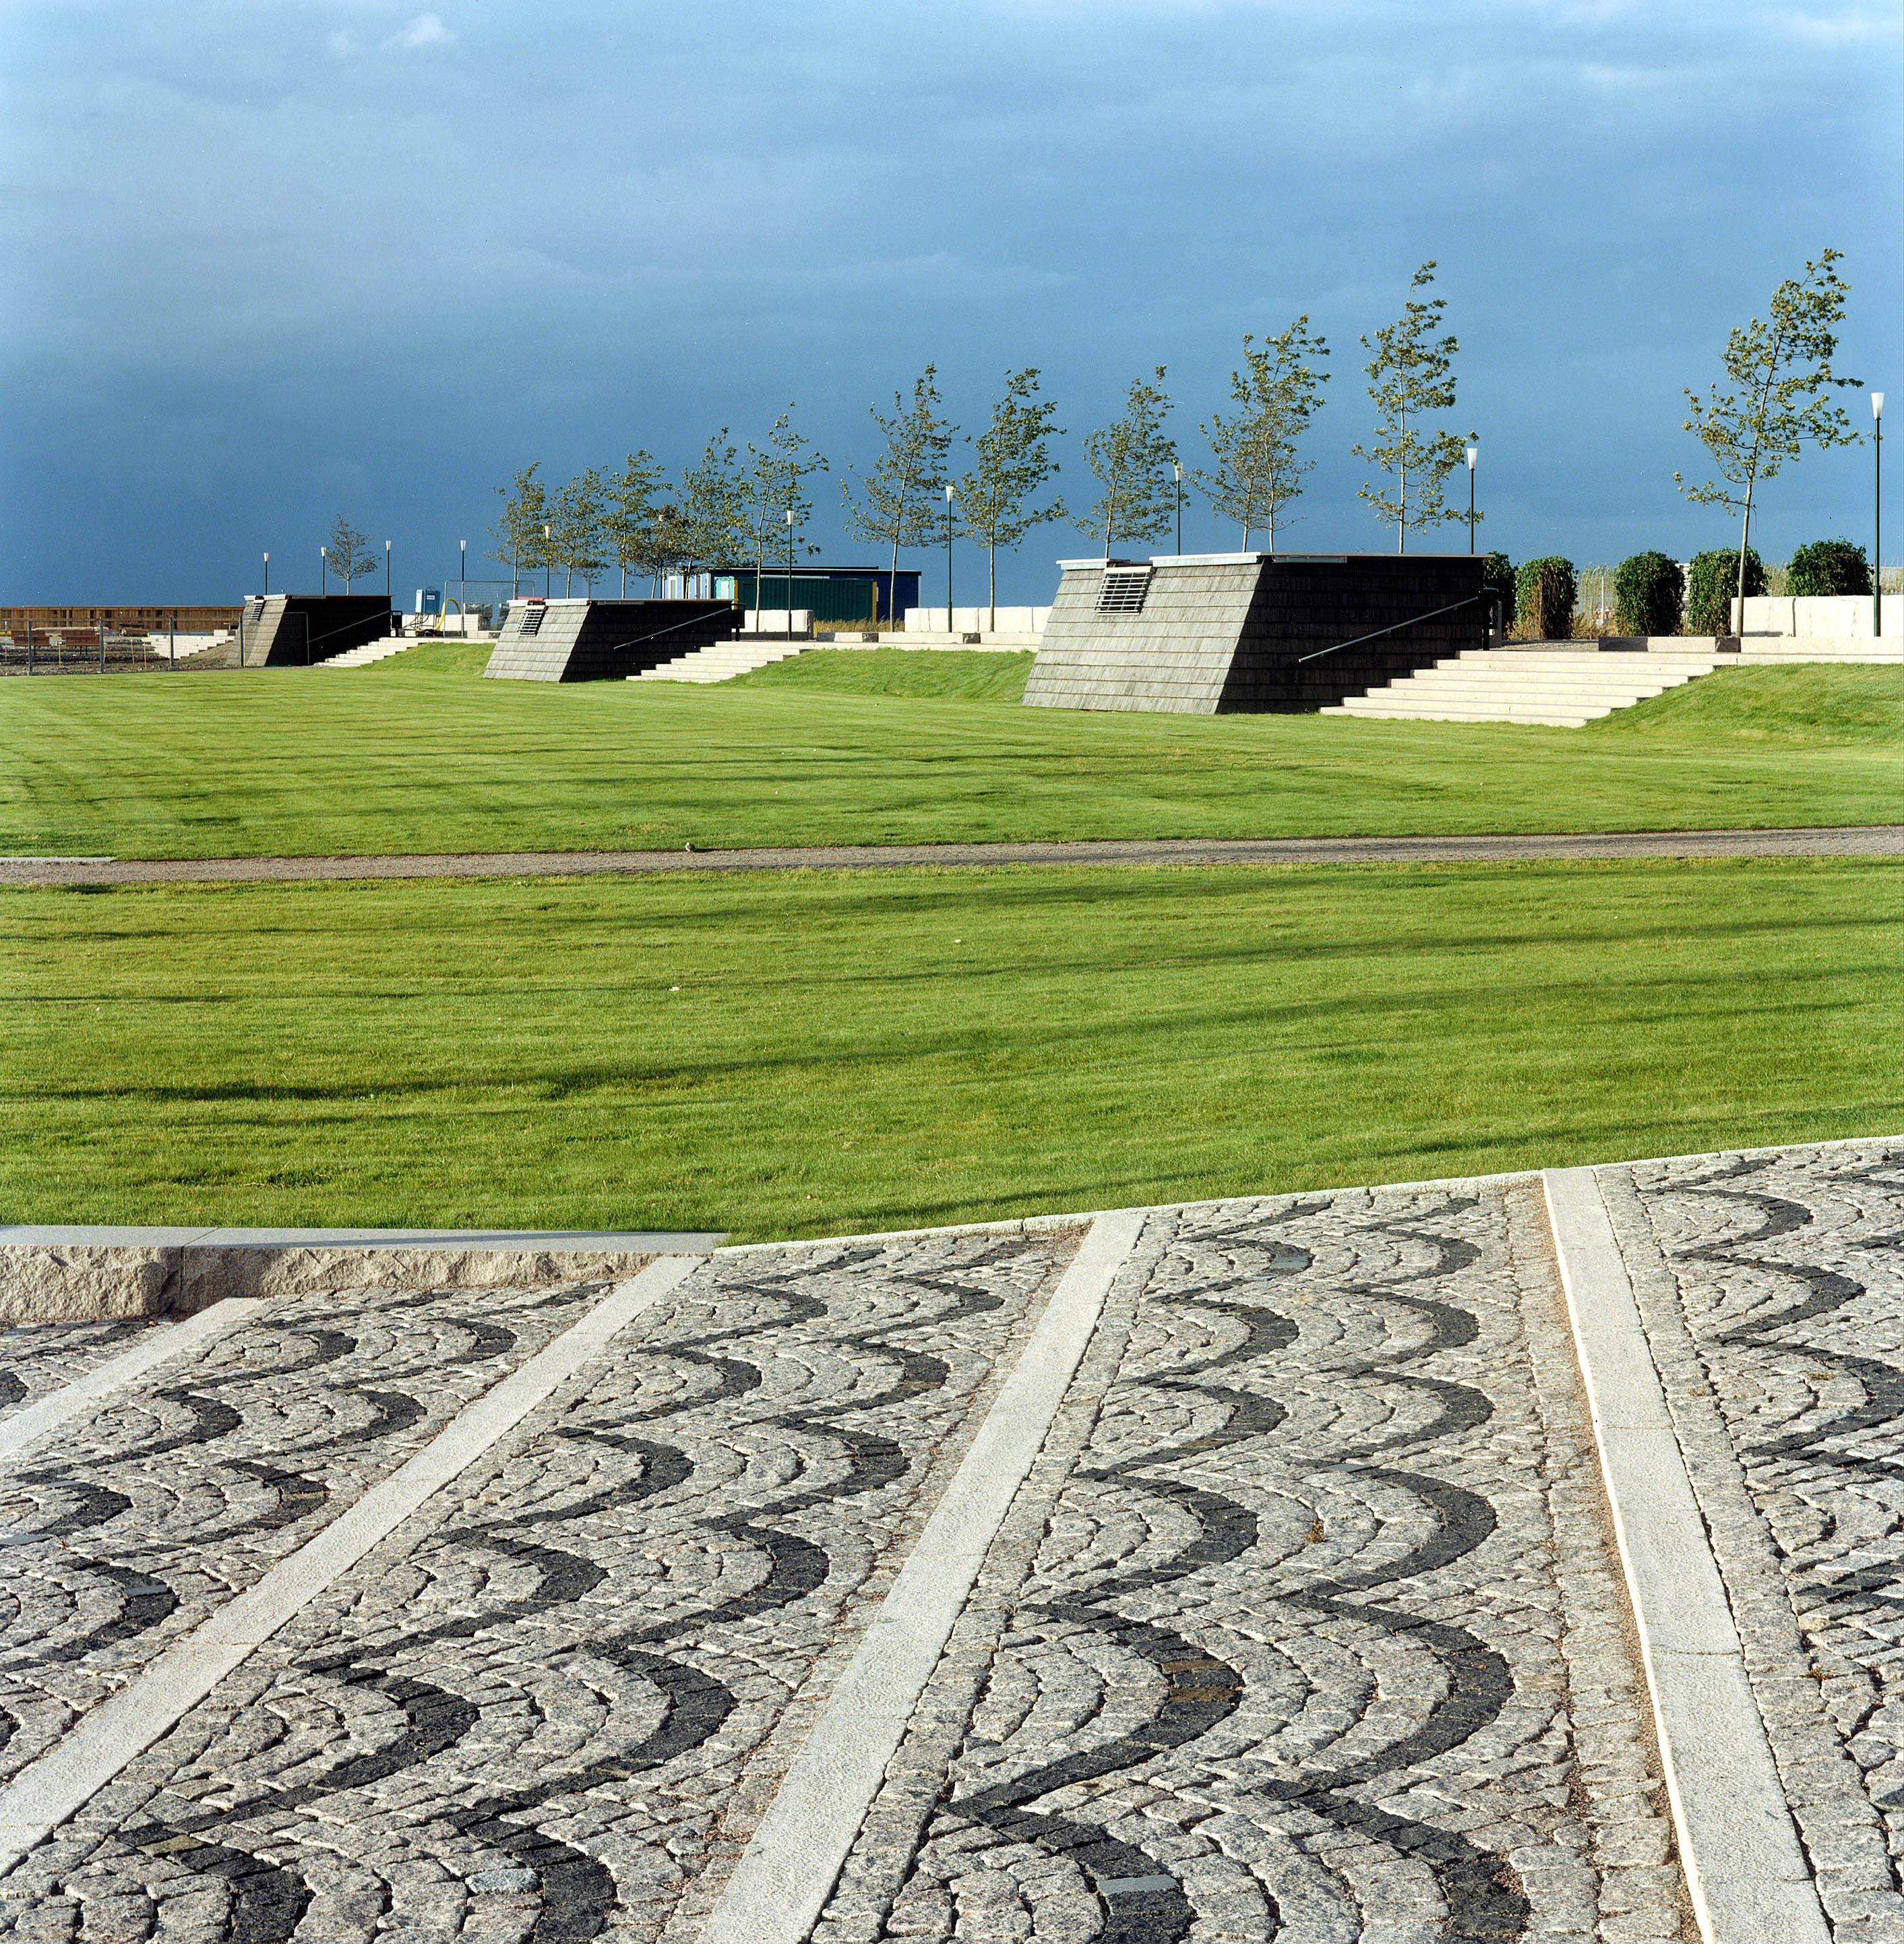 Thorbjorn_Dania Park, Malmo (2)